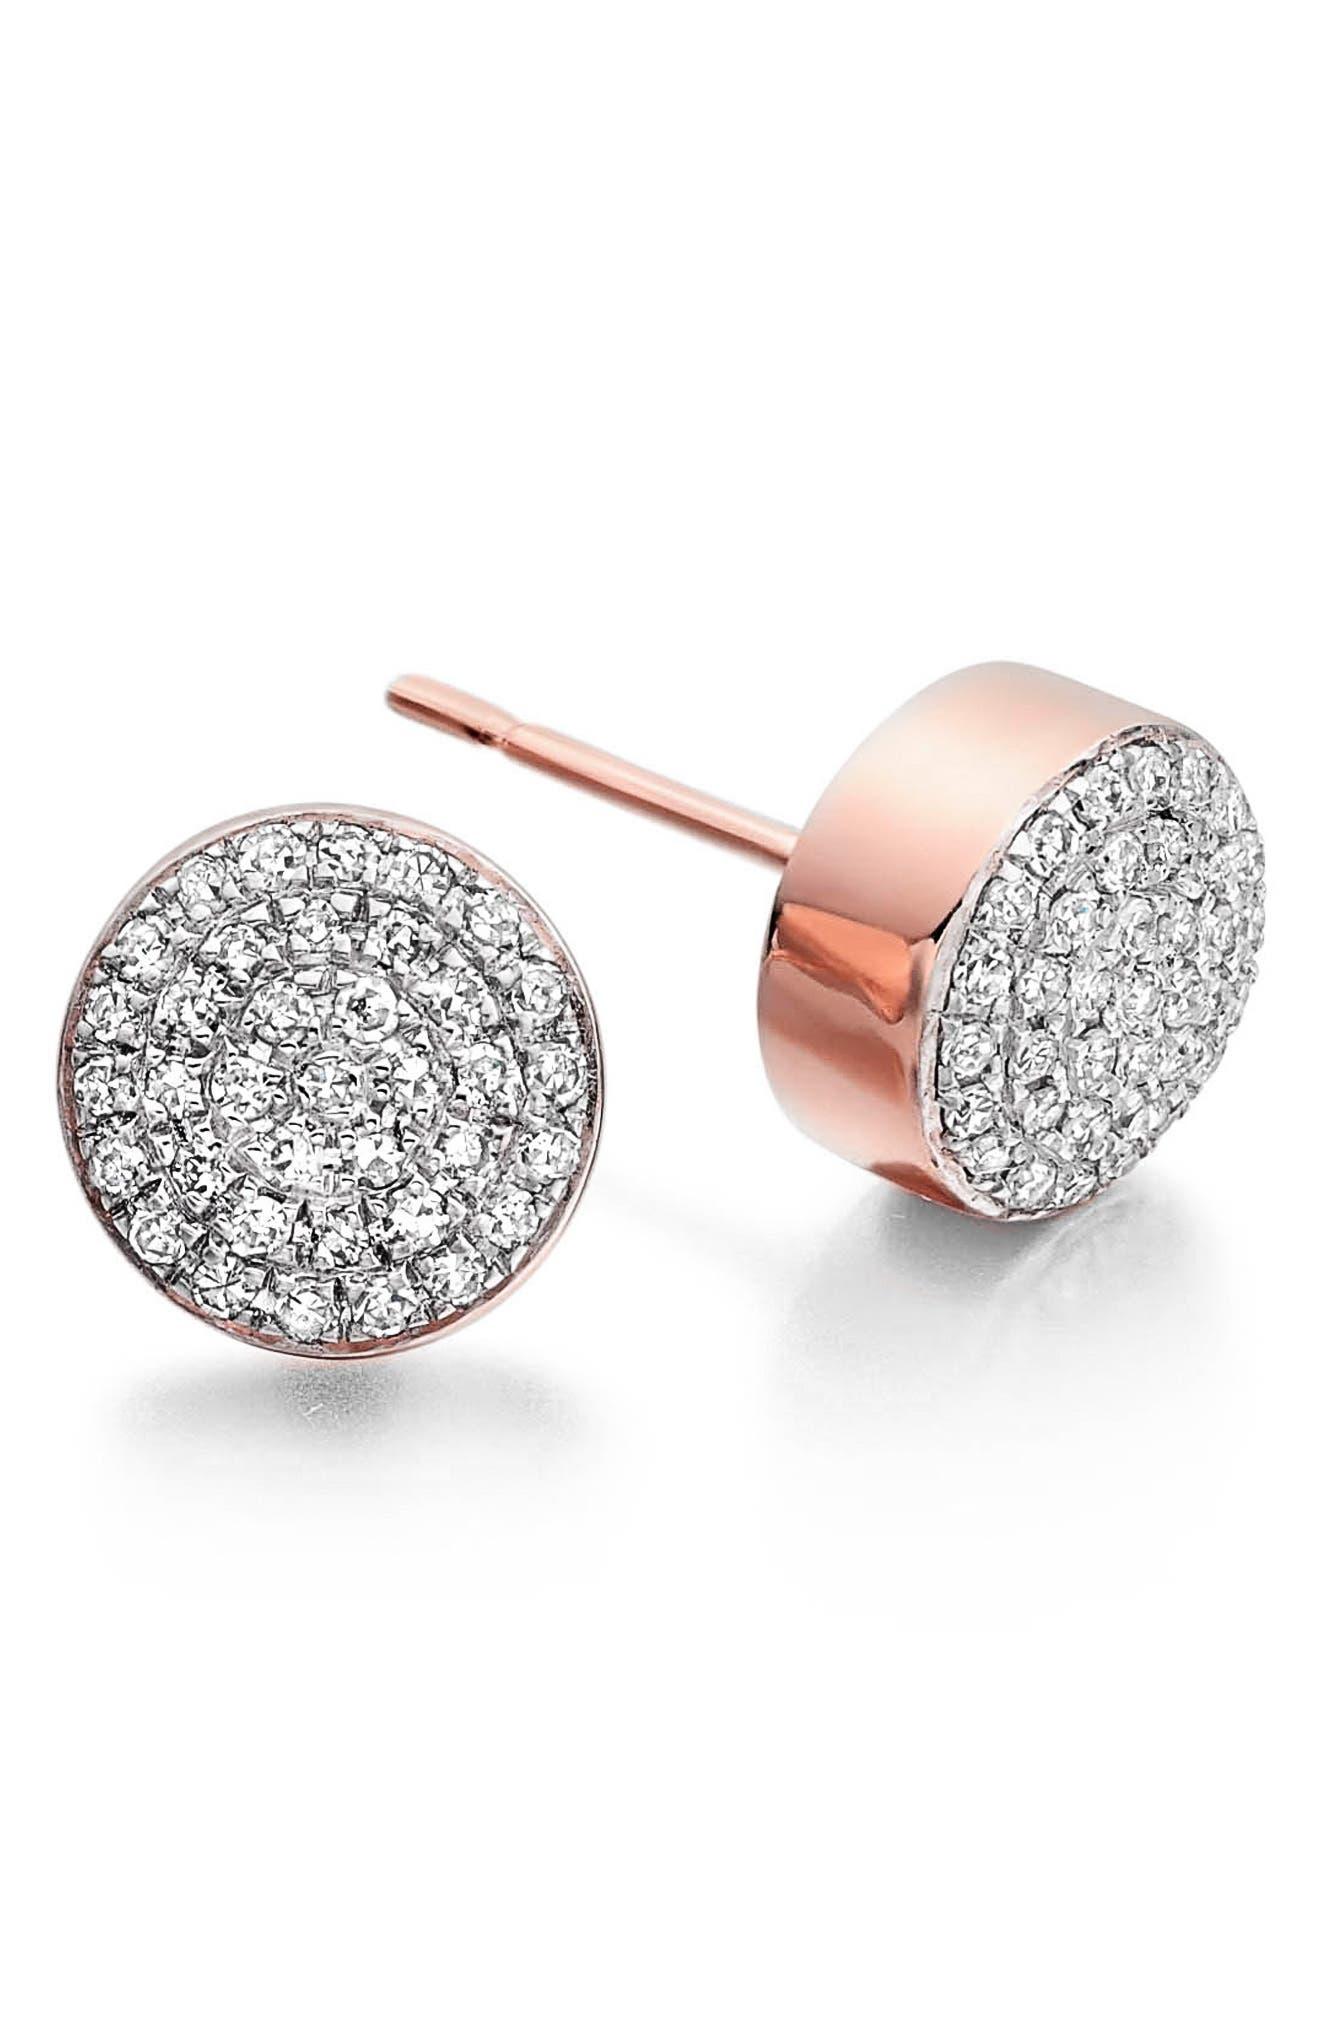 MONICA VINADER 'Ava' Diamond Button Stud Earrings, Main, color, ROSE GOLD